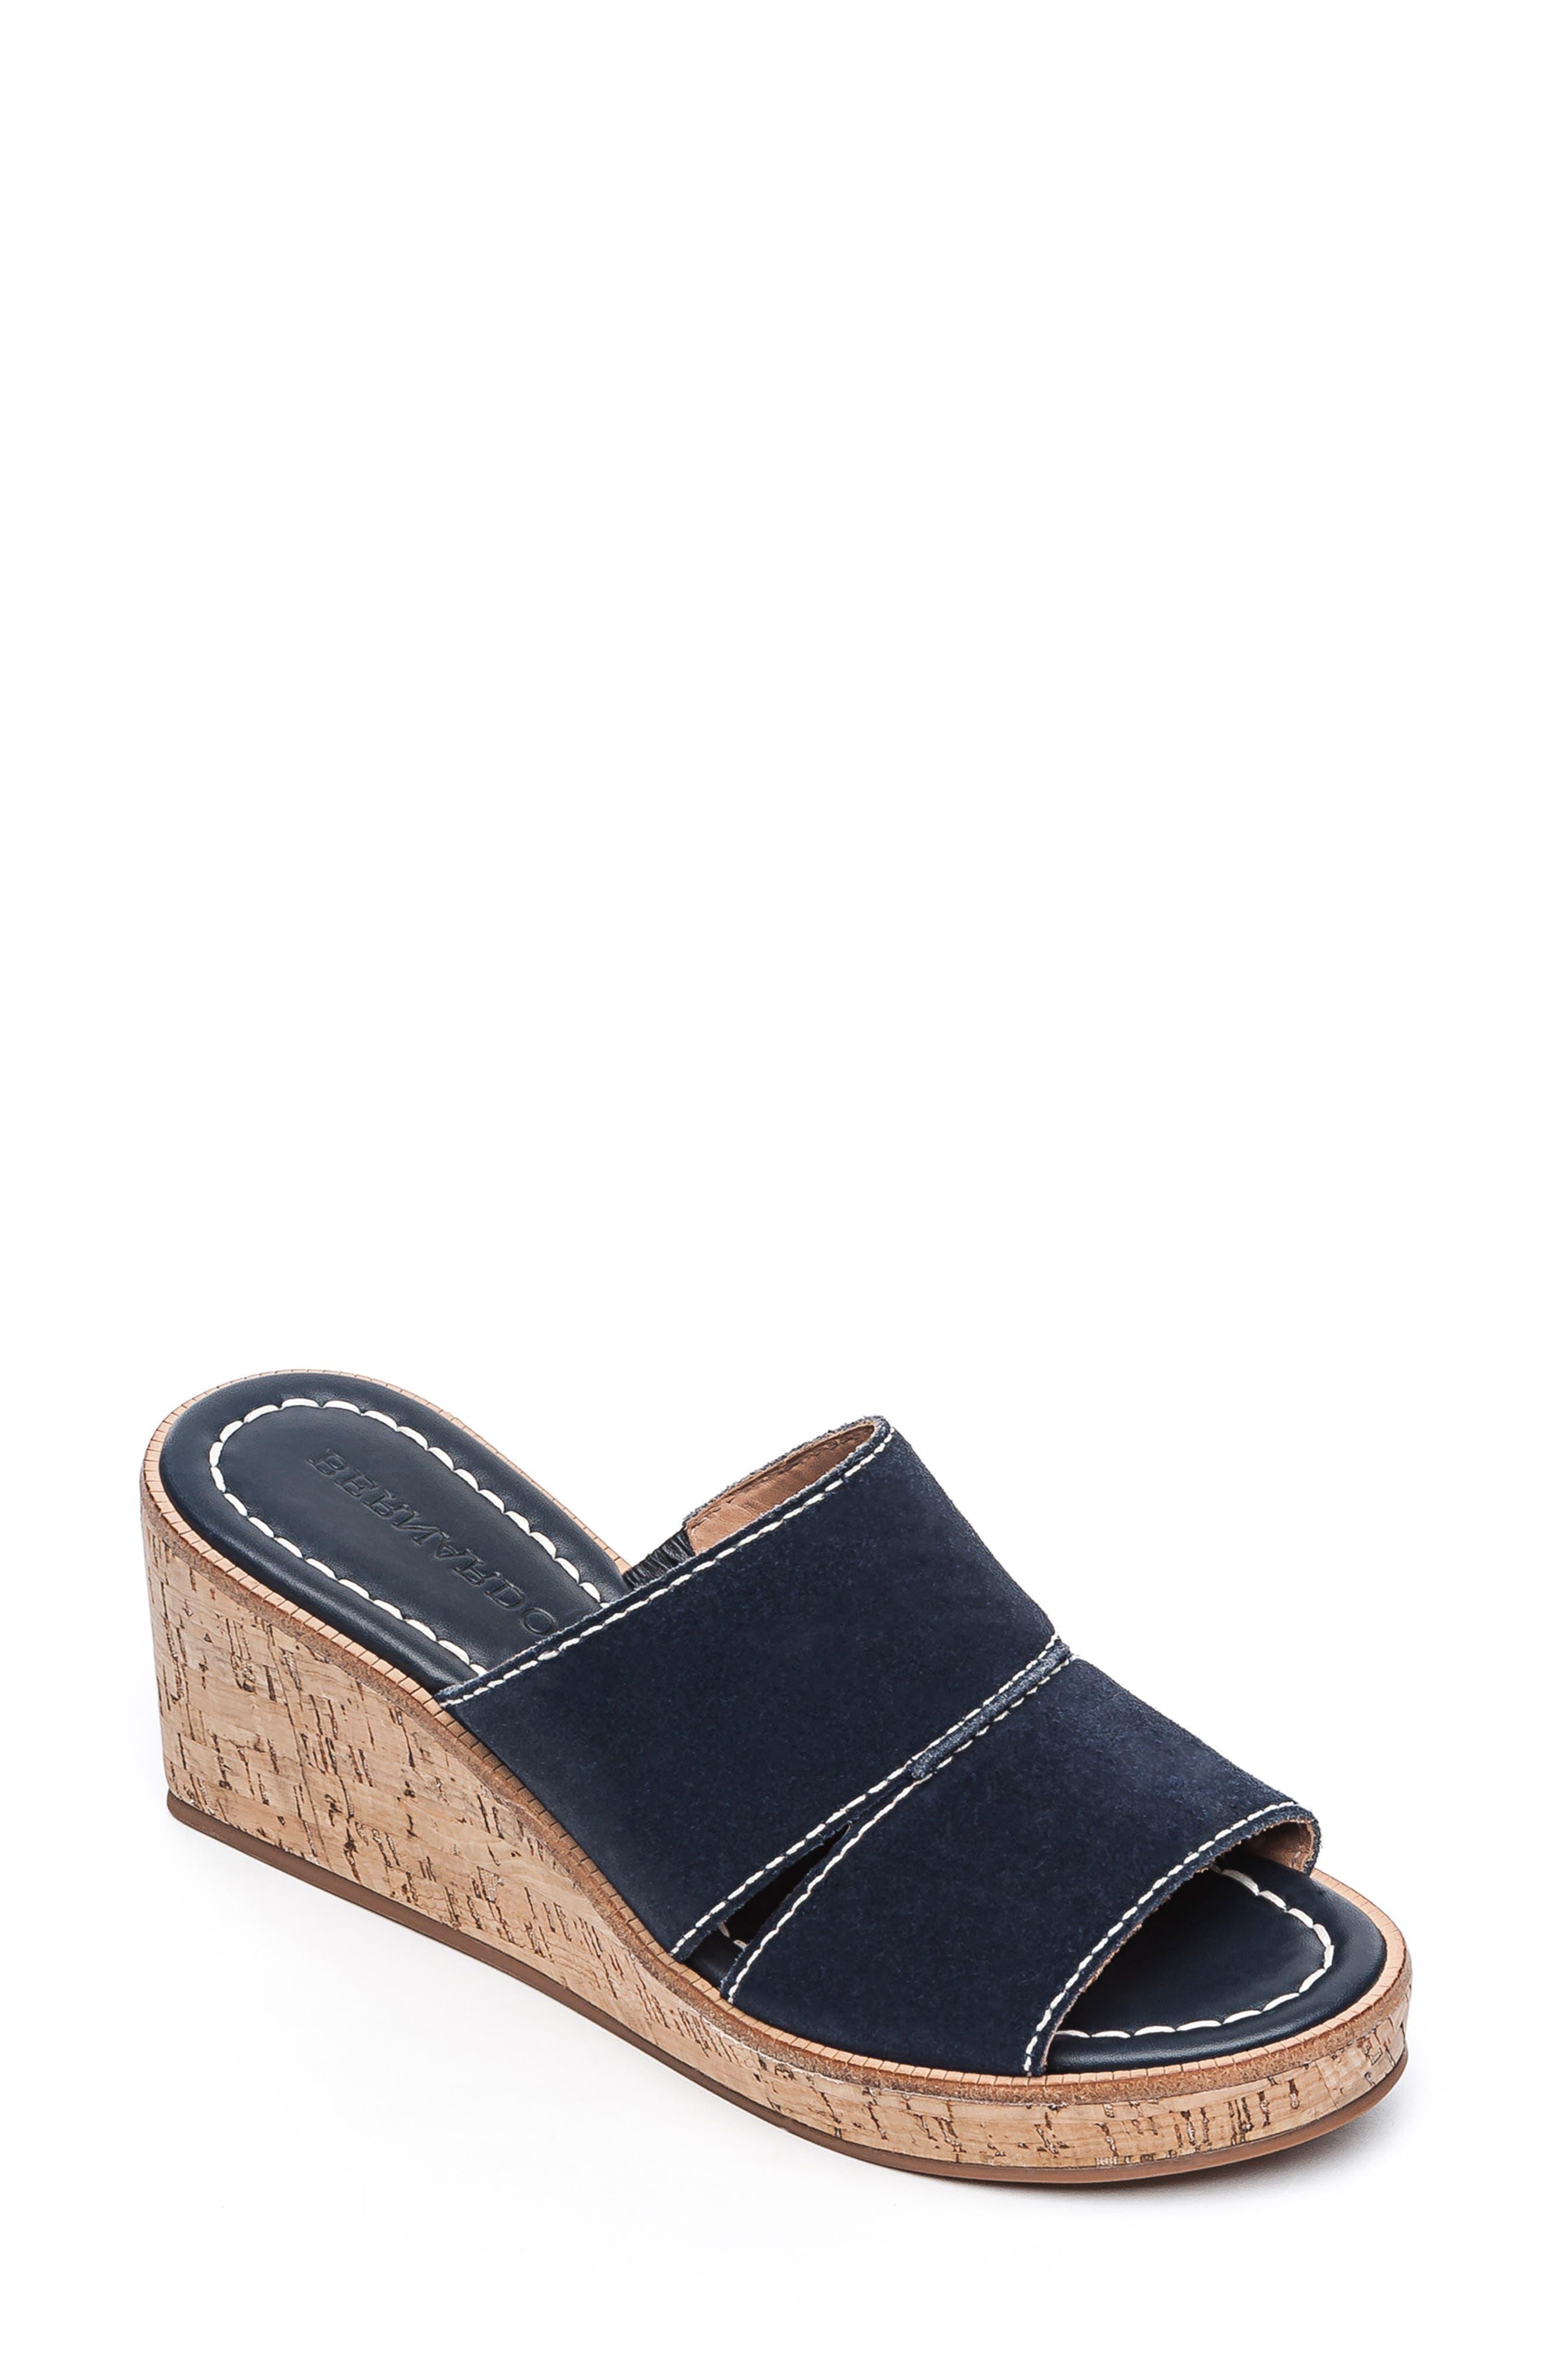 BERNARDO, Kami Platform Wedge Slide Sandal, Main thumbnail 1, color, NAVY SUEDE